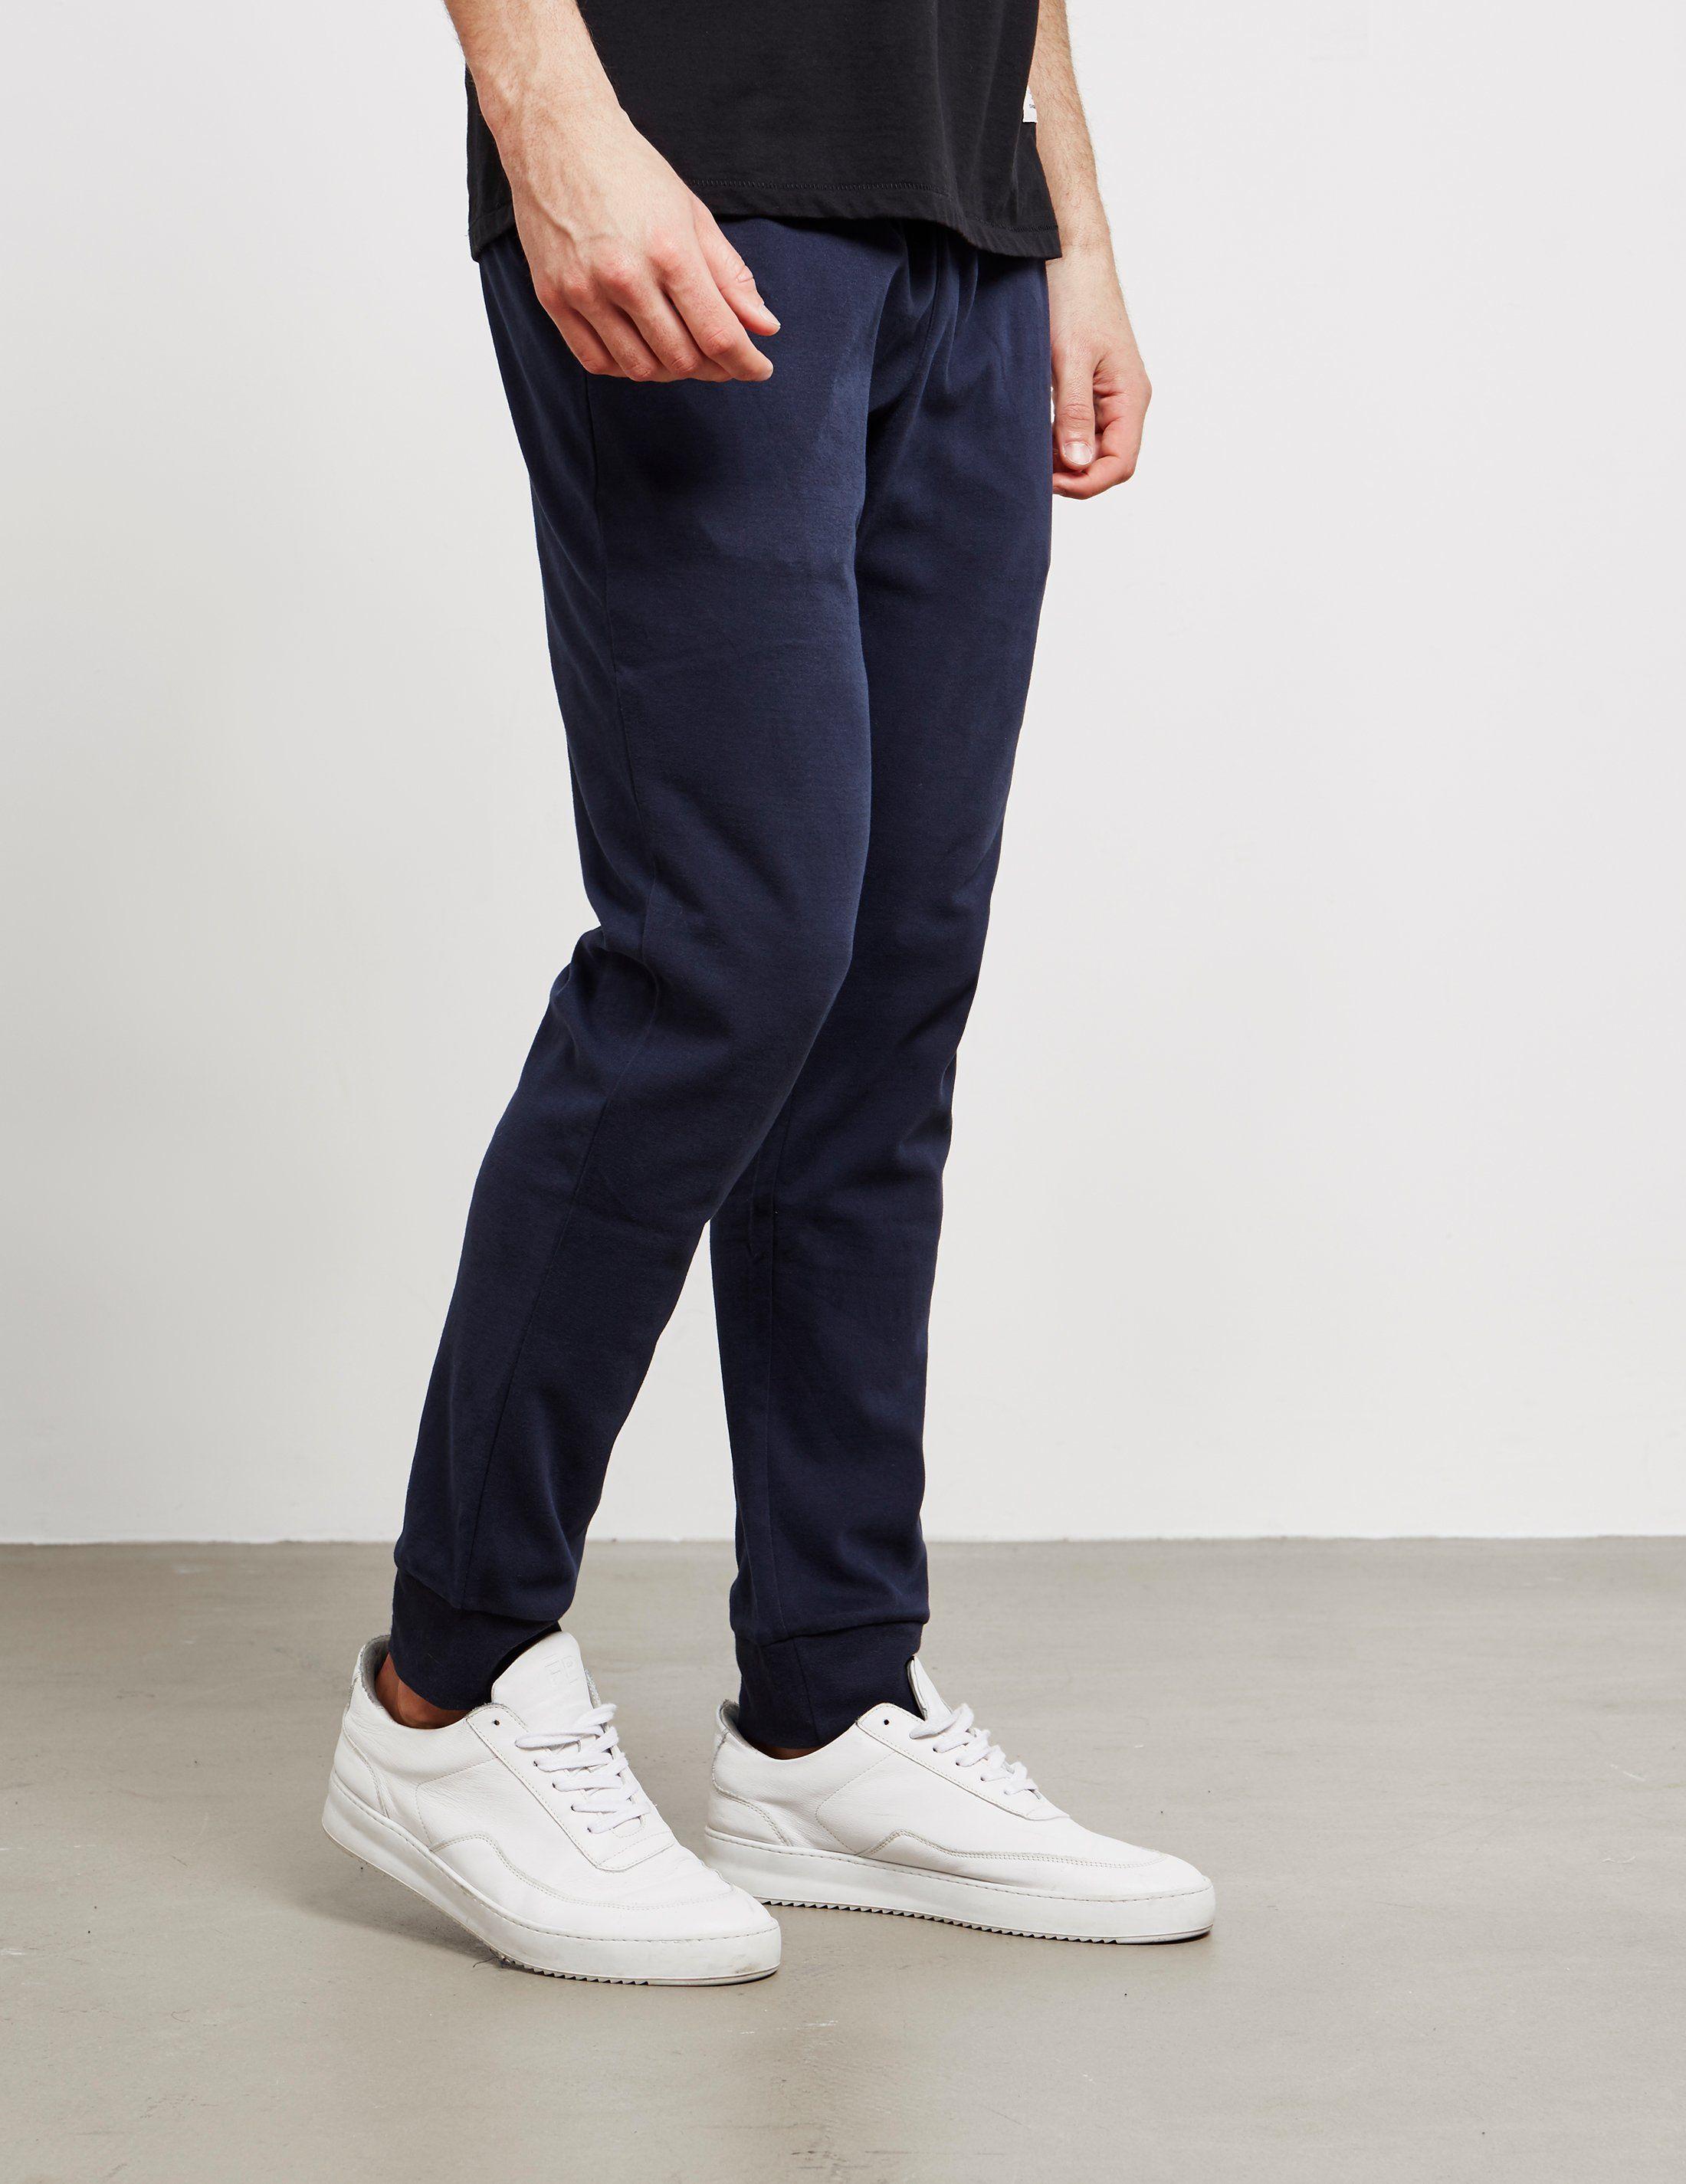 Emporio Armani Small Icon Cuffed Fleece Pants